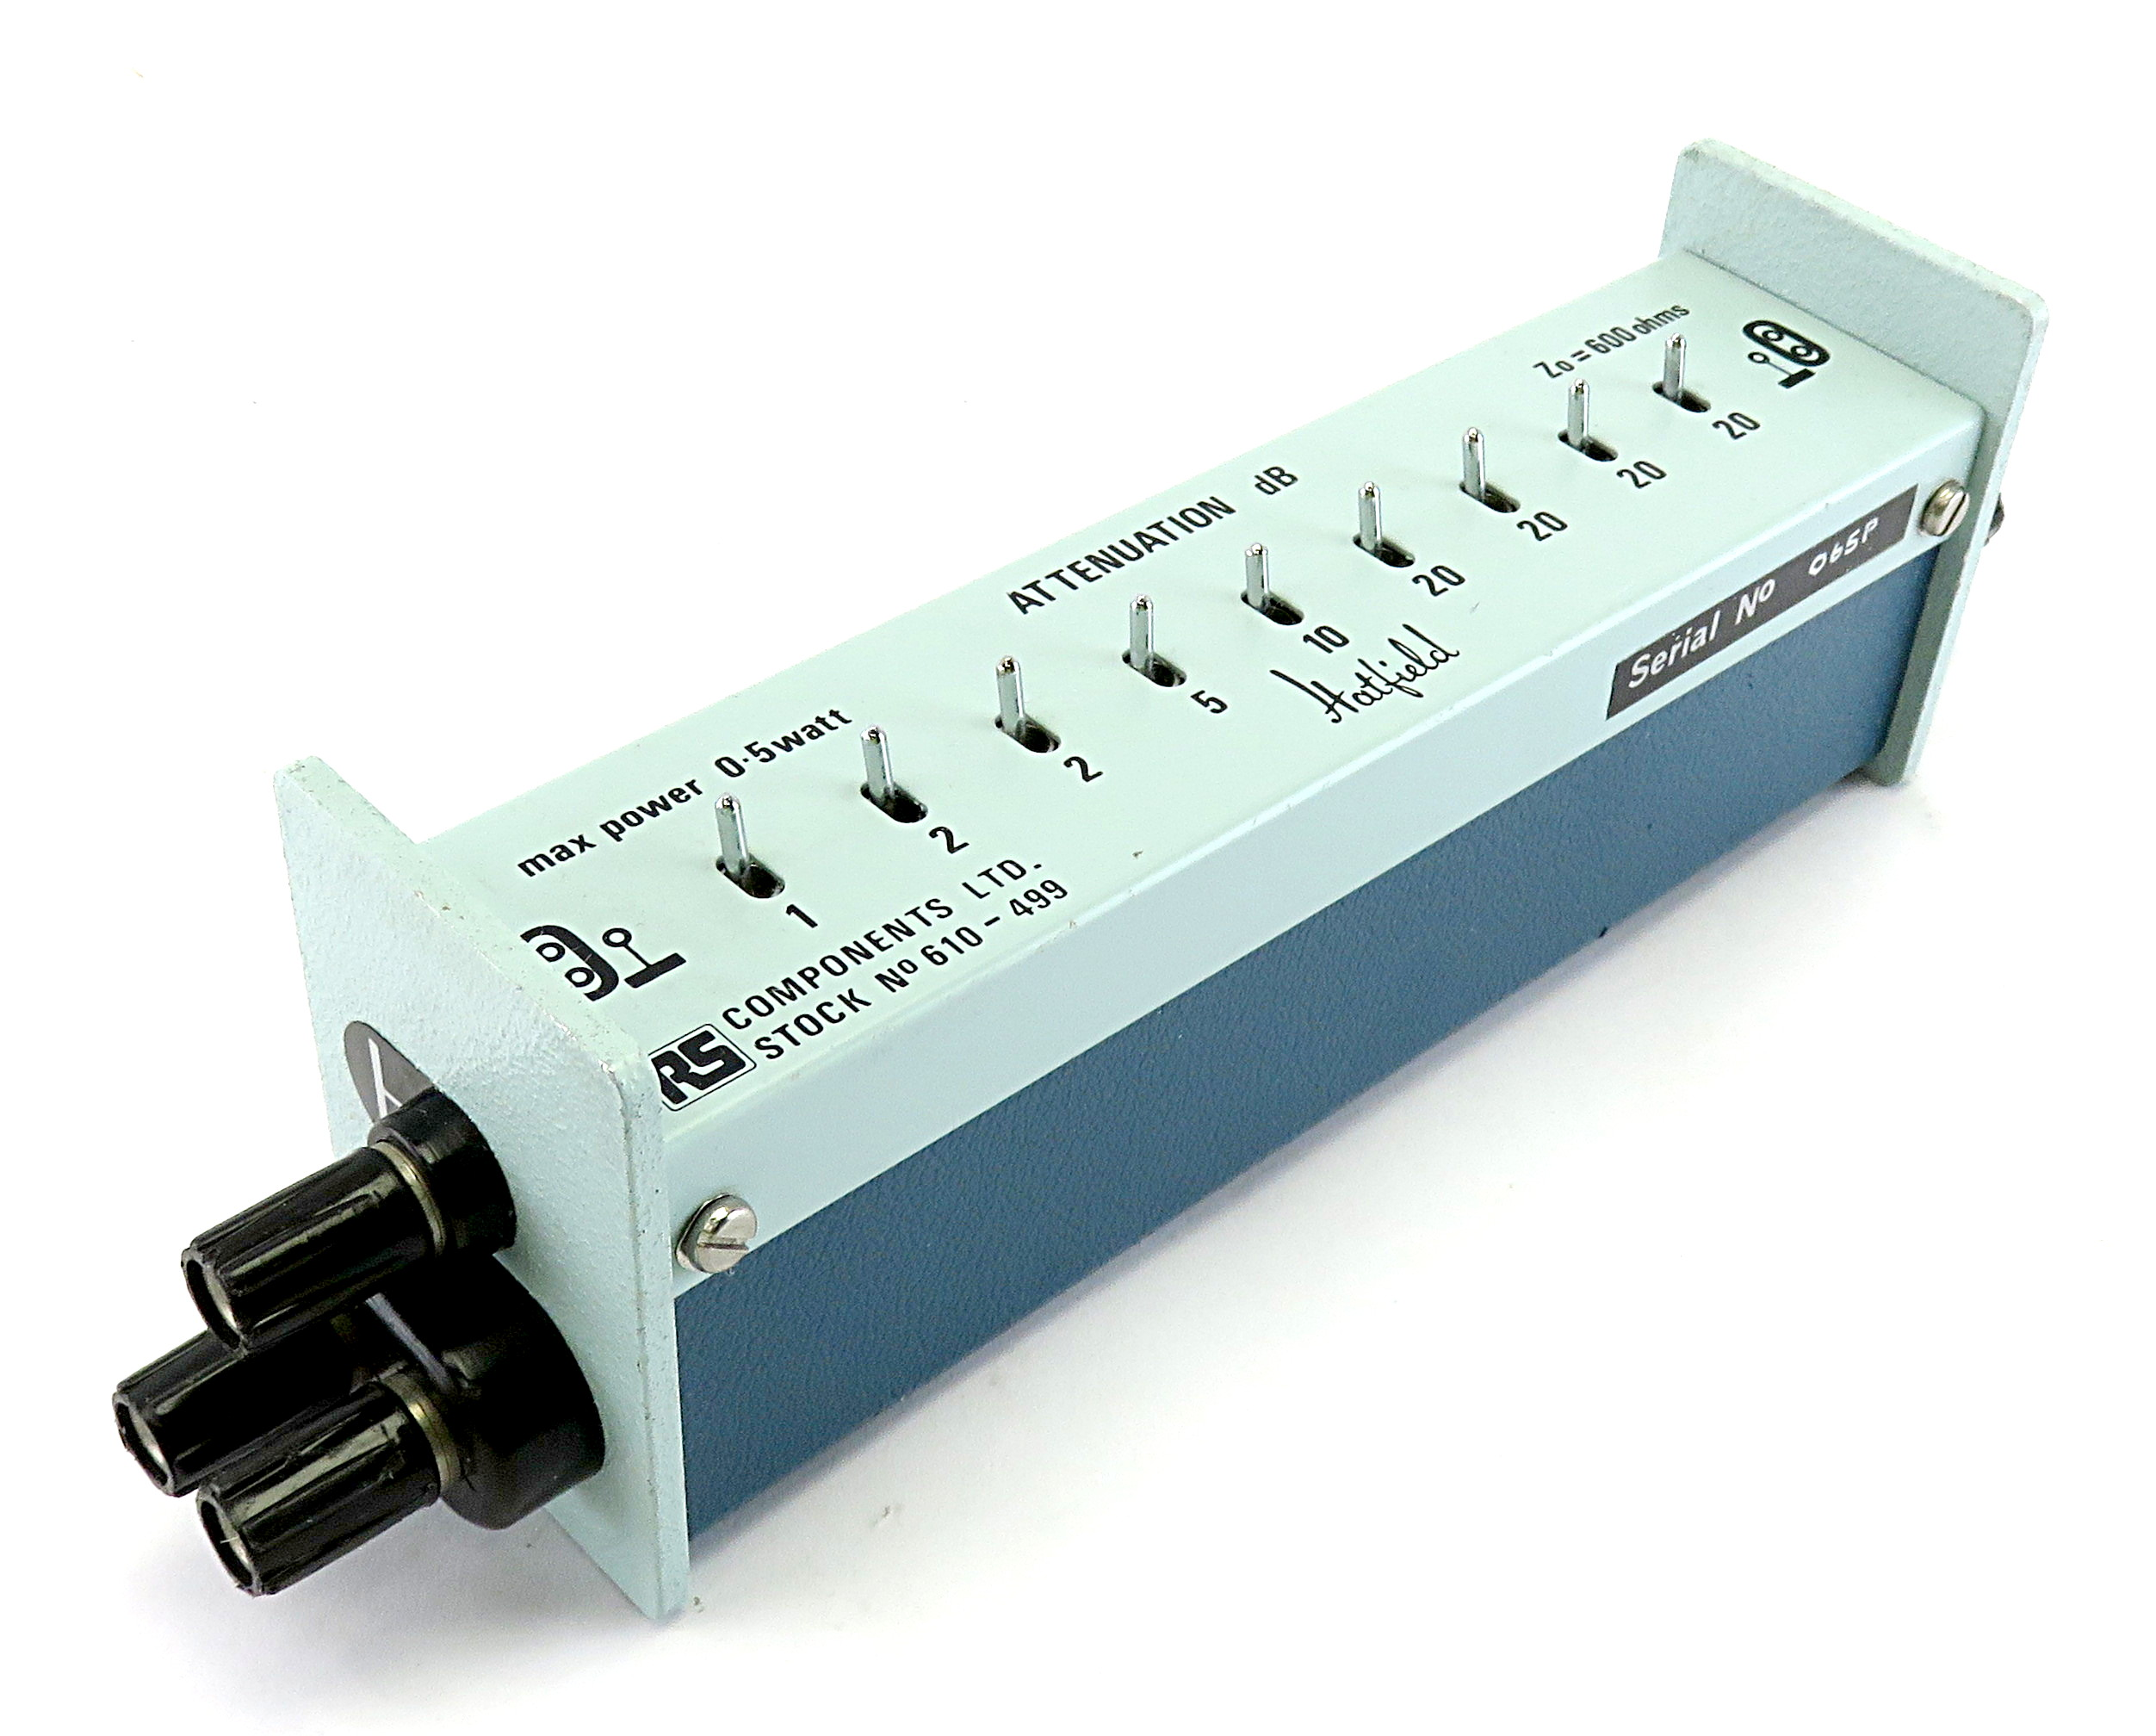 Hatfield Instruments Attenuator Type 2135 600 Ohm Variable Attenuator